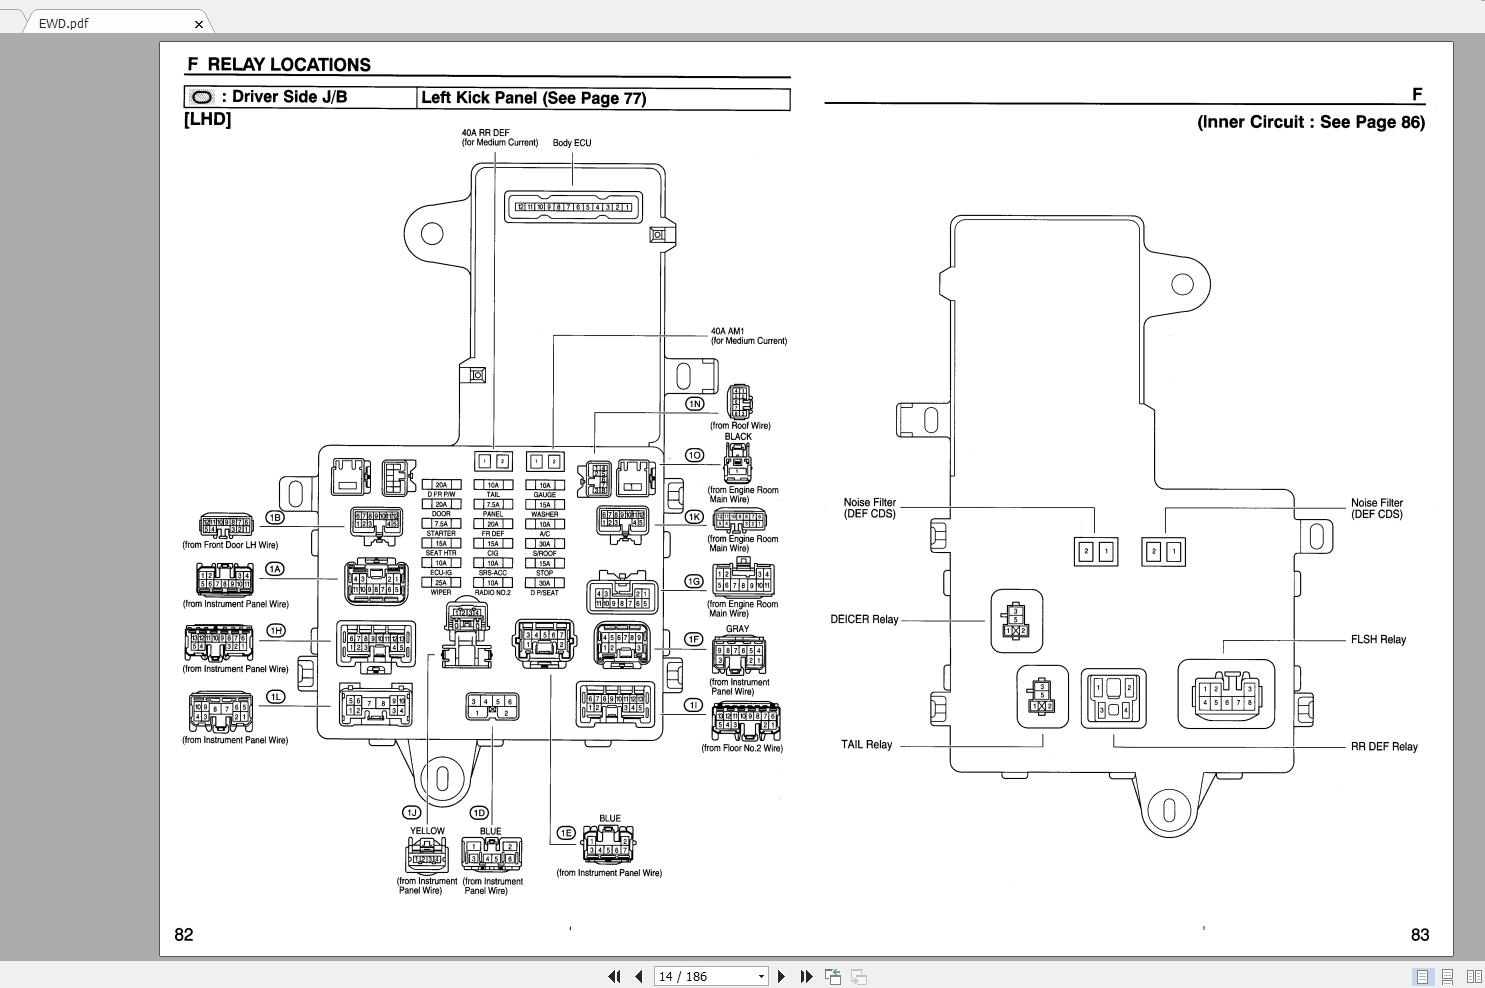 lexus is200 [1999.01] electrical wiring diagram - auto repair software-auto  epc software-auto repair manual-workshop manual-service manual-workshop  manual  auto repair software-auto epc software-auto repair manual